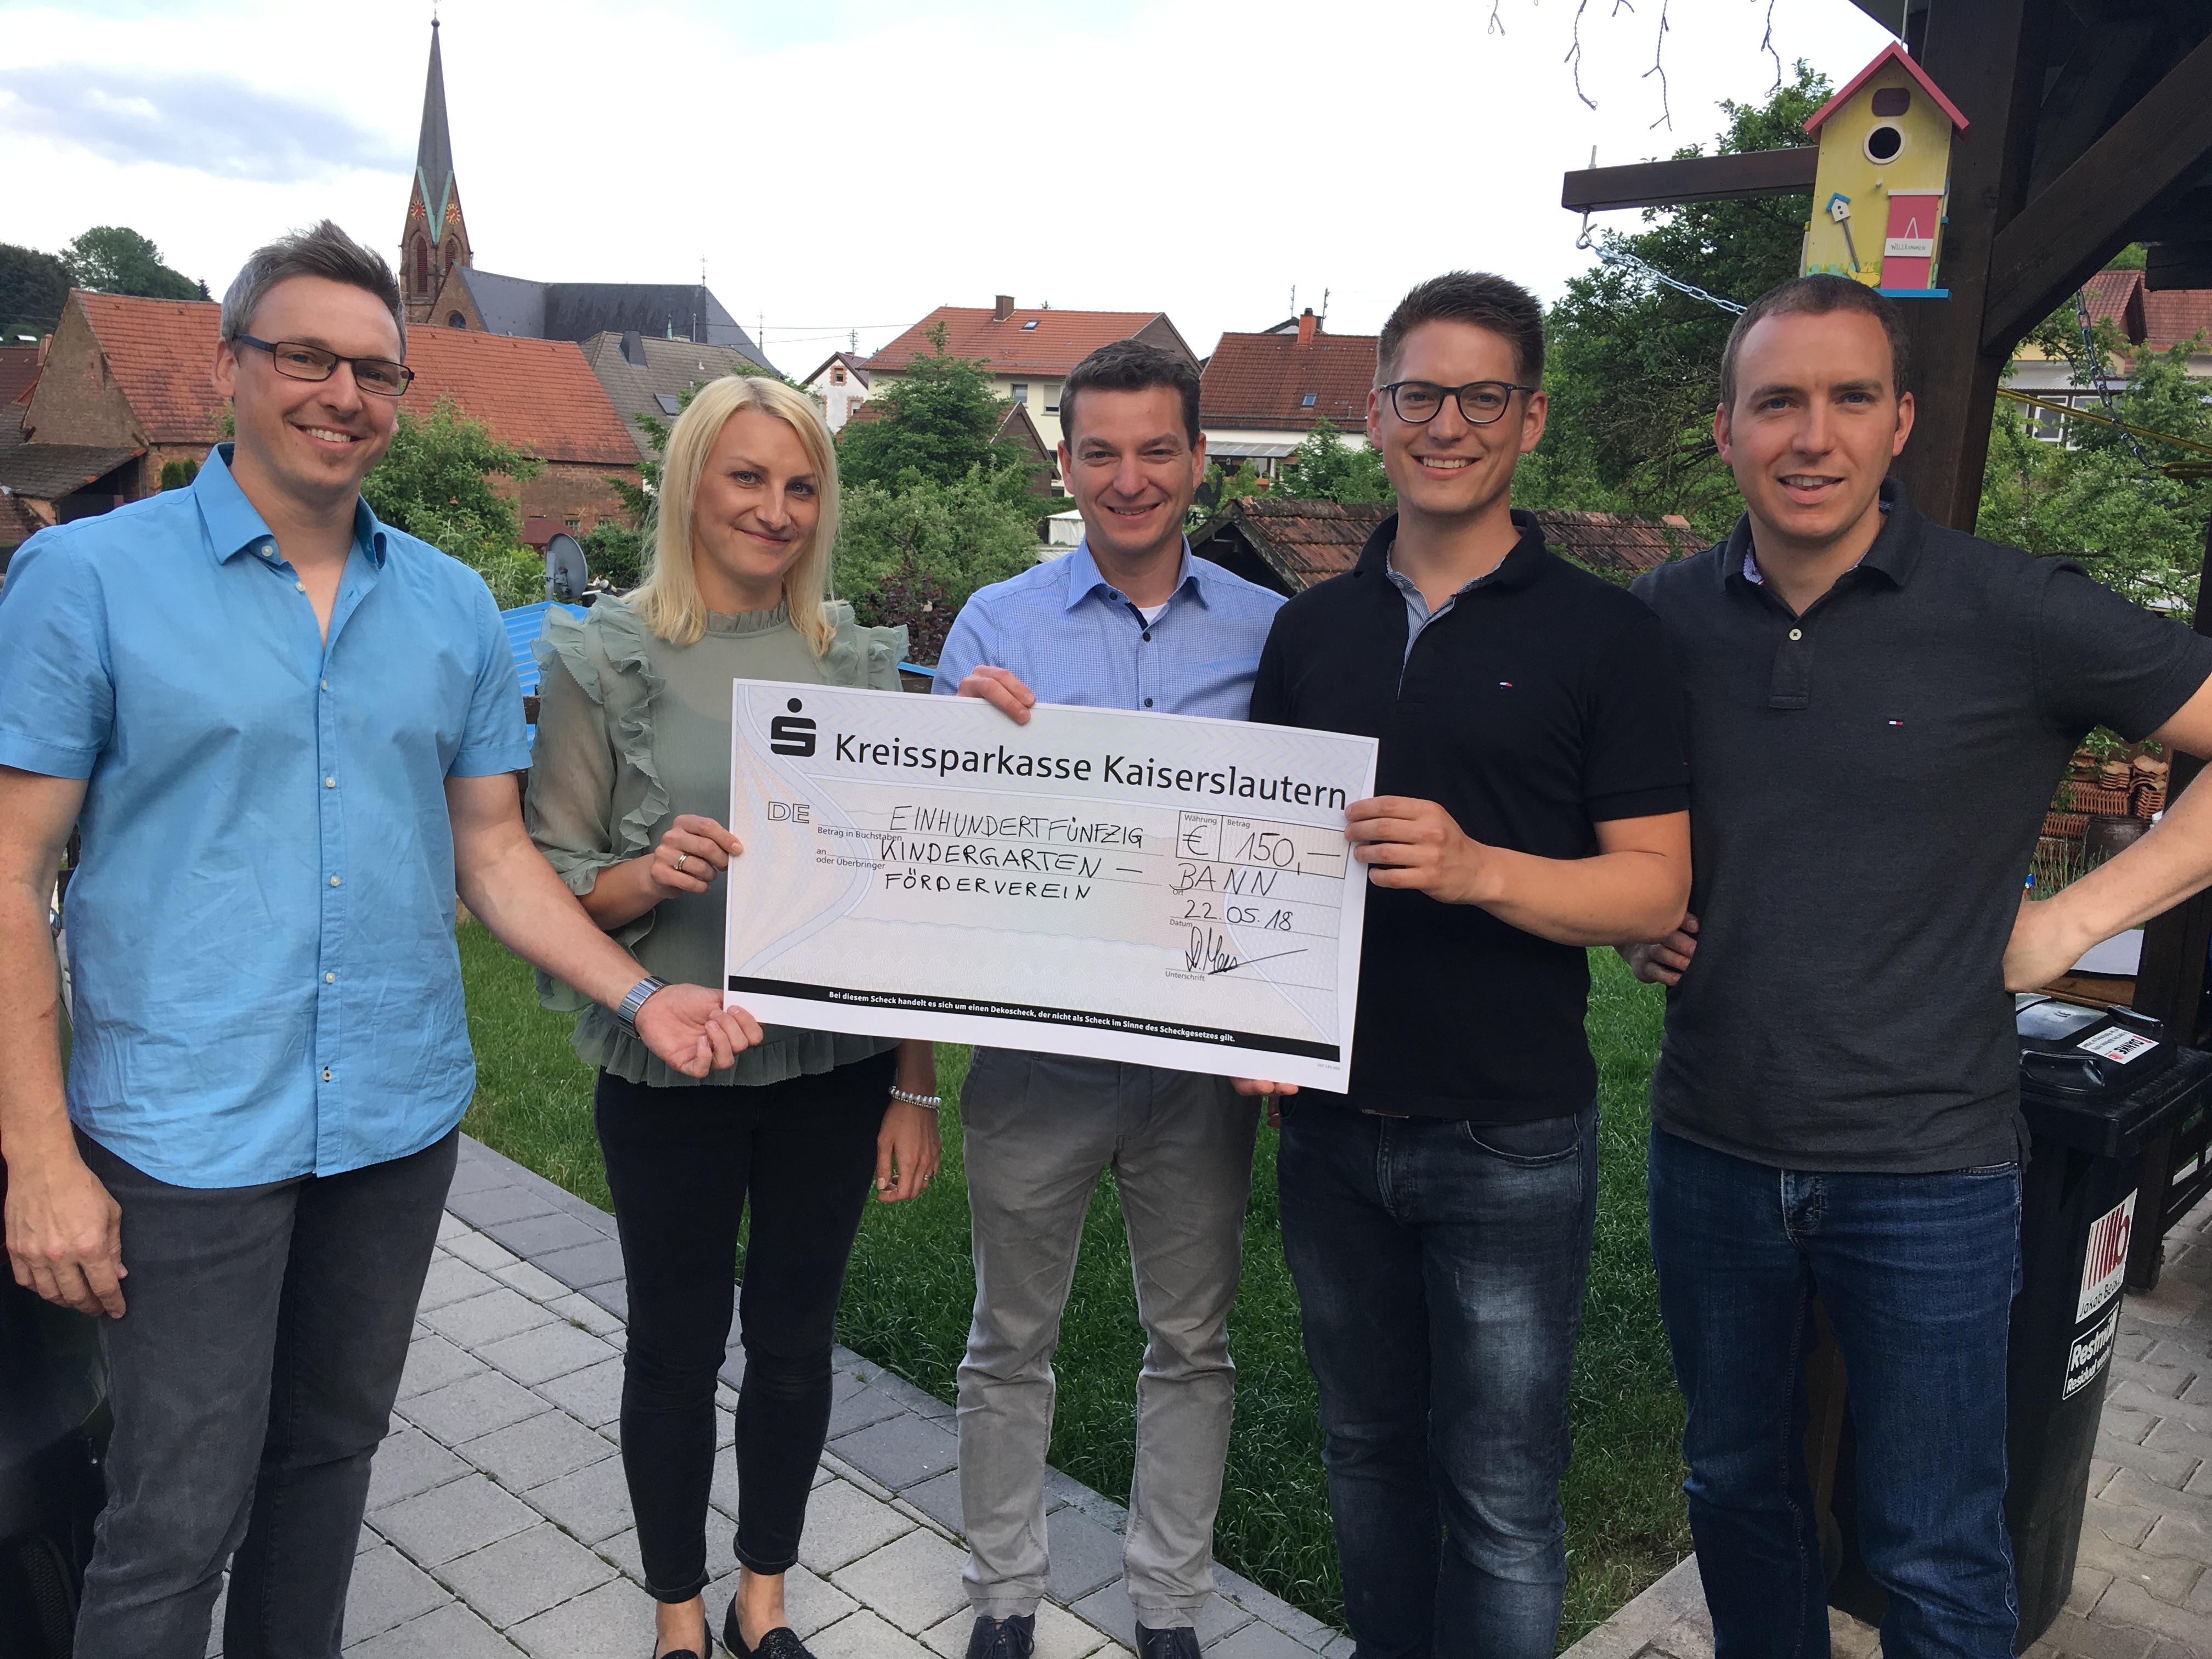 CDU Spendenübergabe 22.05.2018